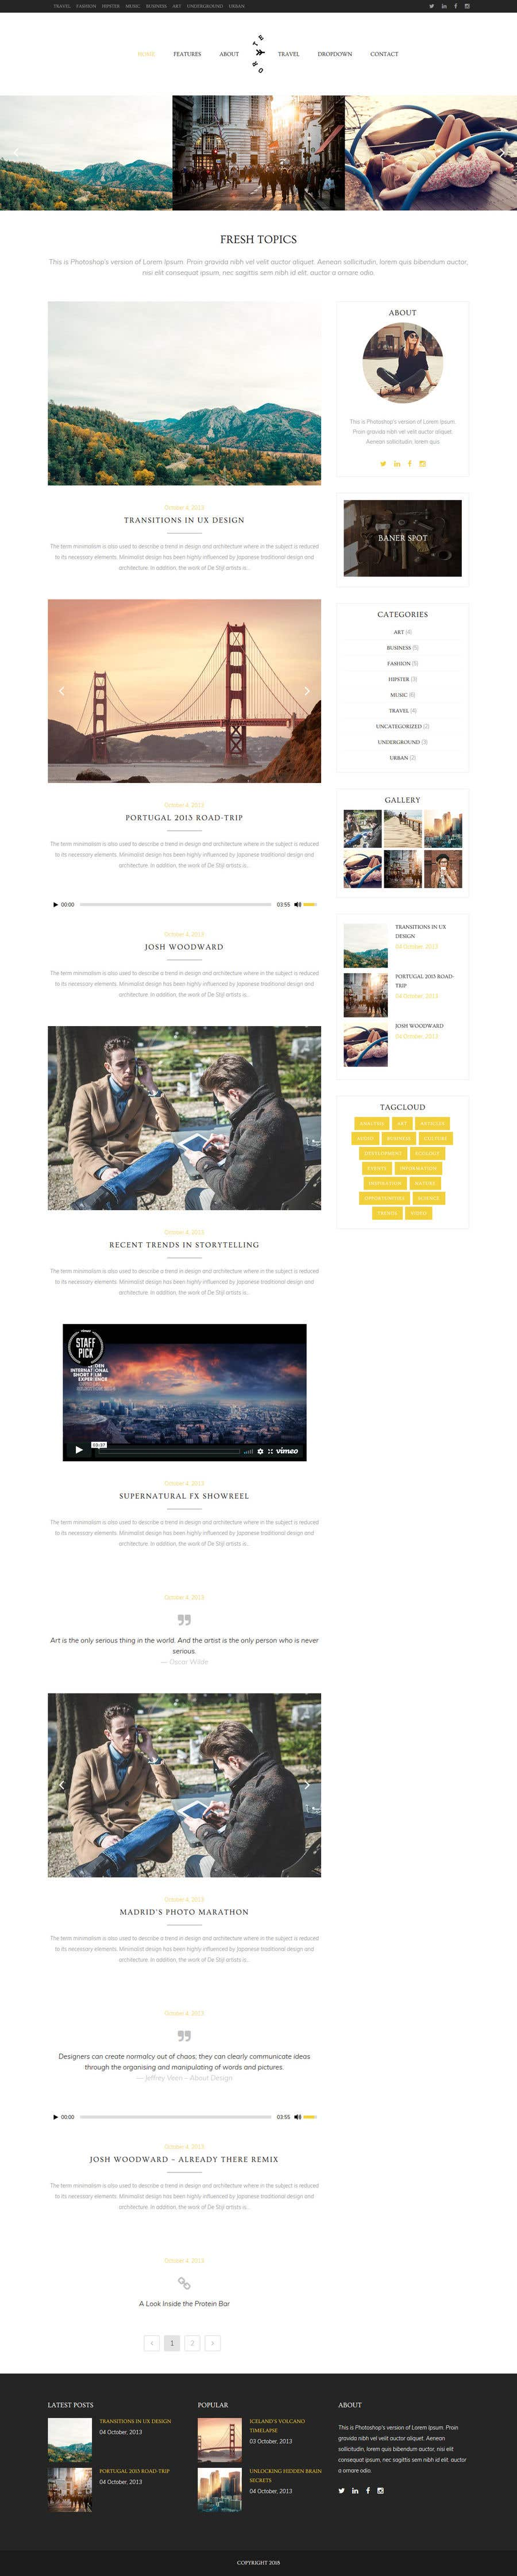 Konkurrenceindlæg #10 for Build A Blog - Design a Brand